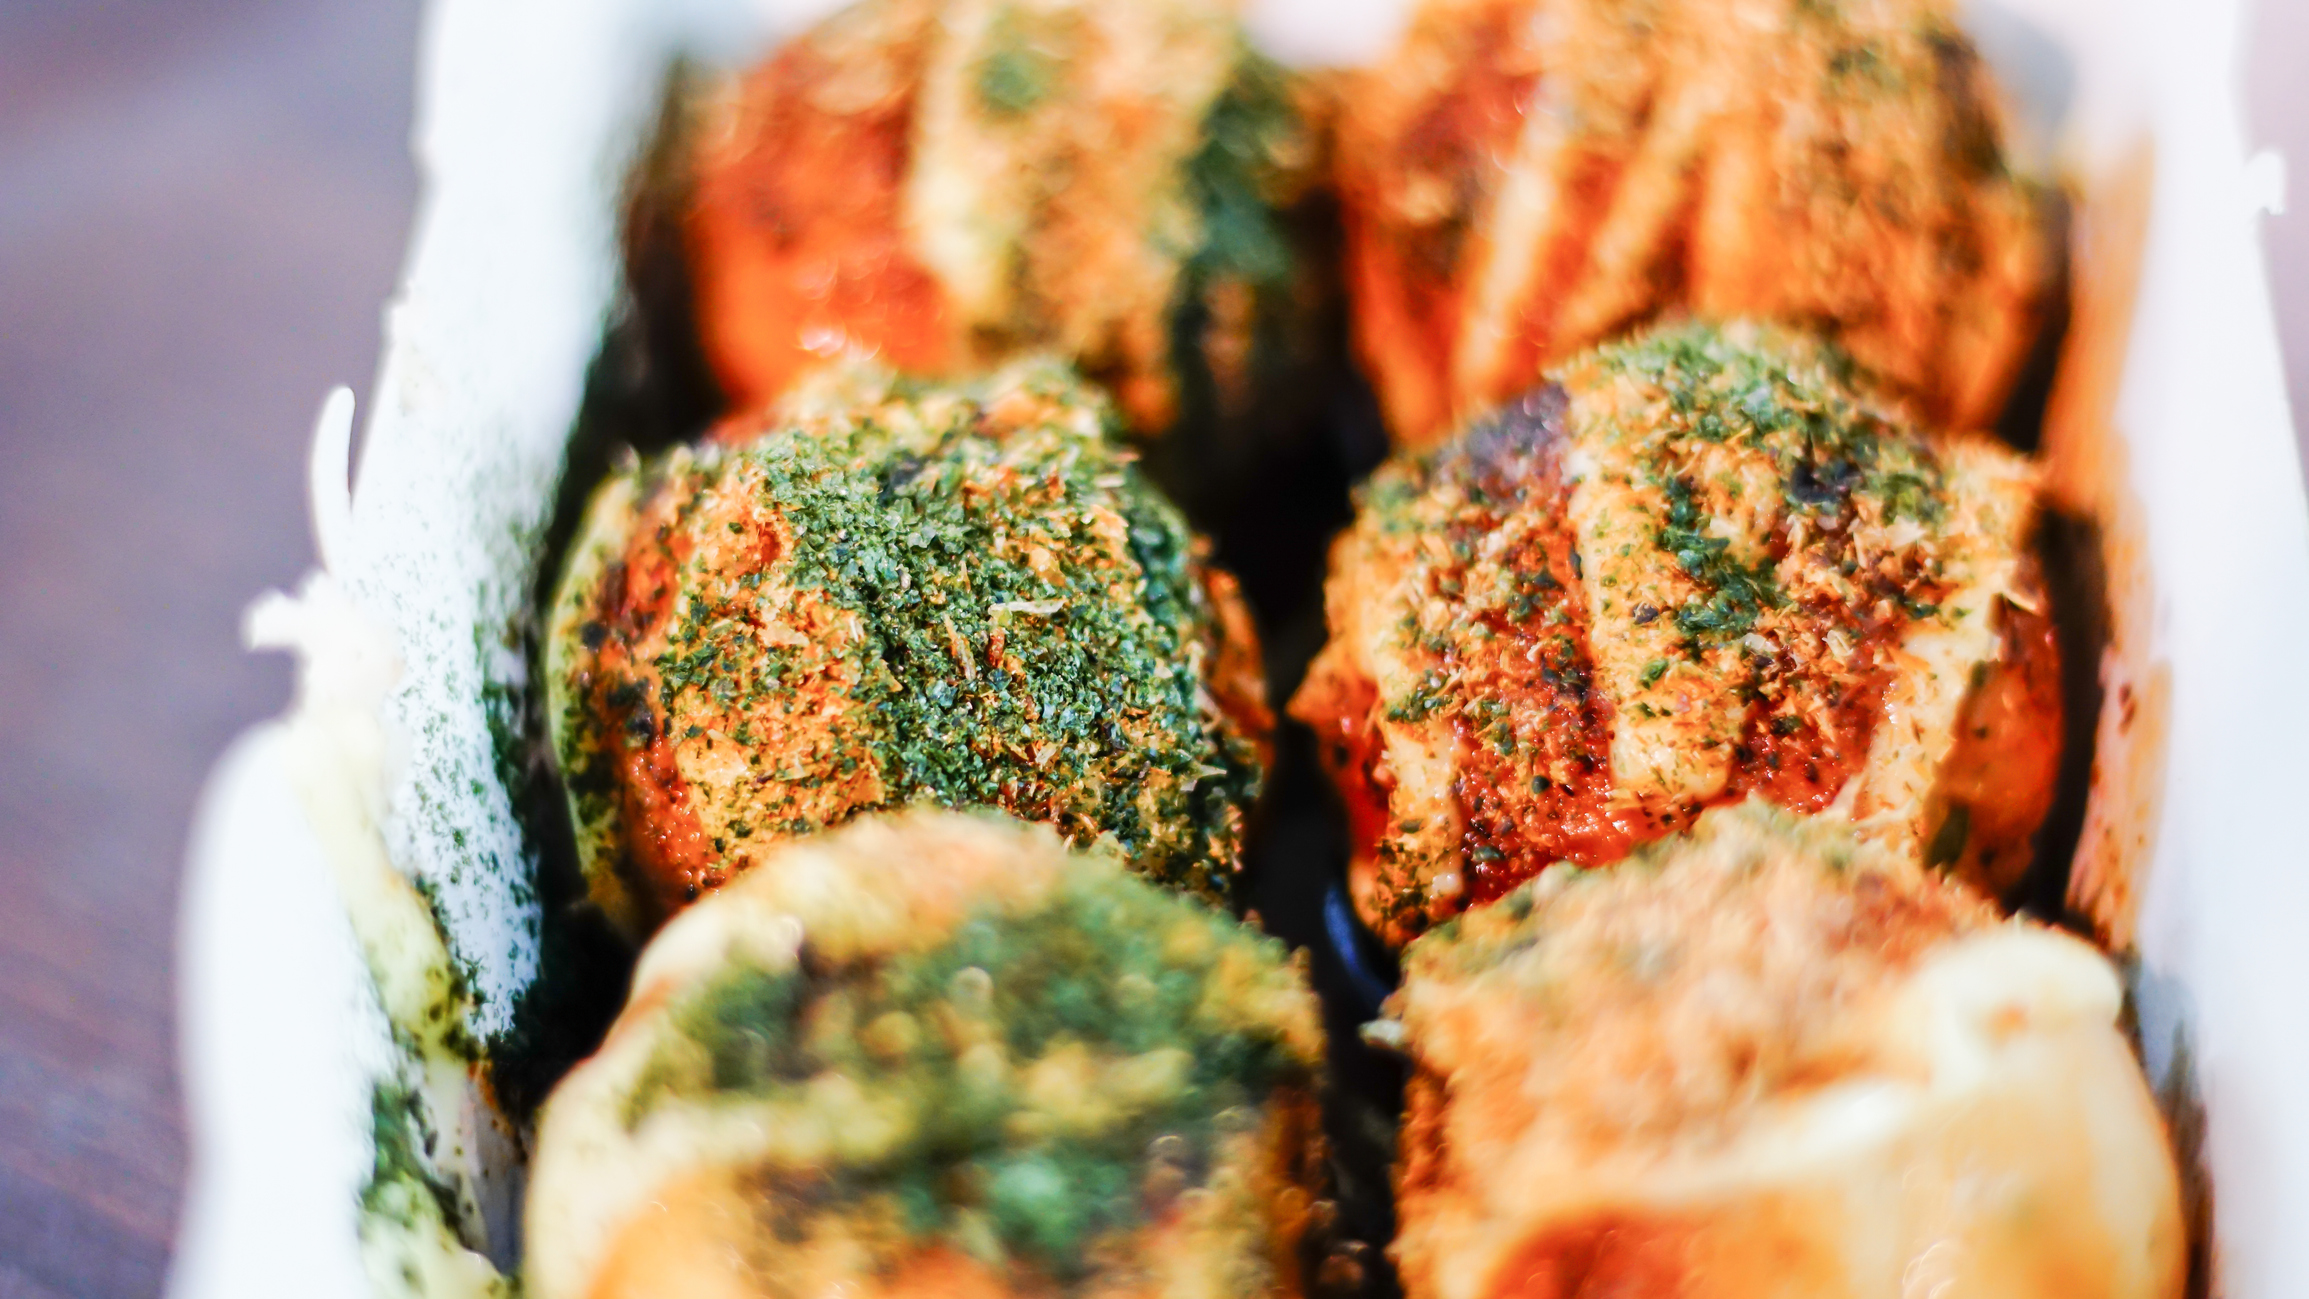 Eating Like A Local: A B-Kyu Gurume - Takoyaki balls